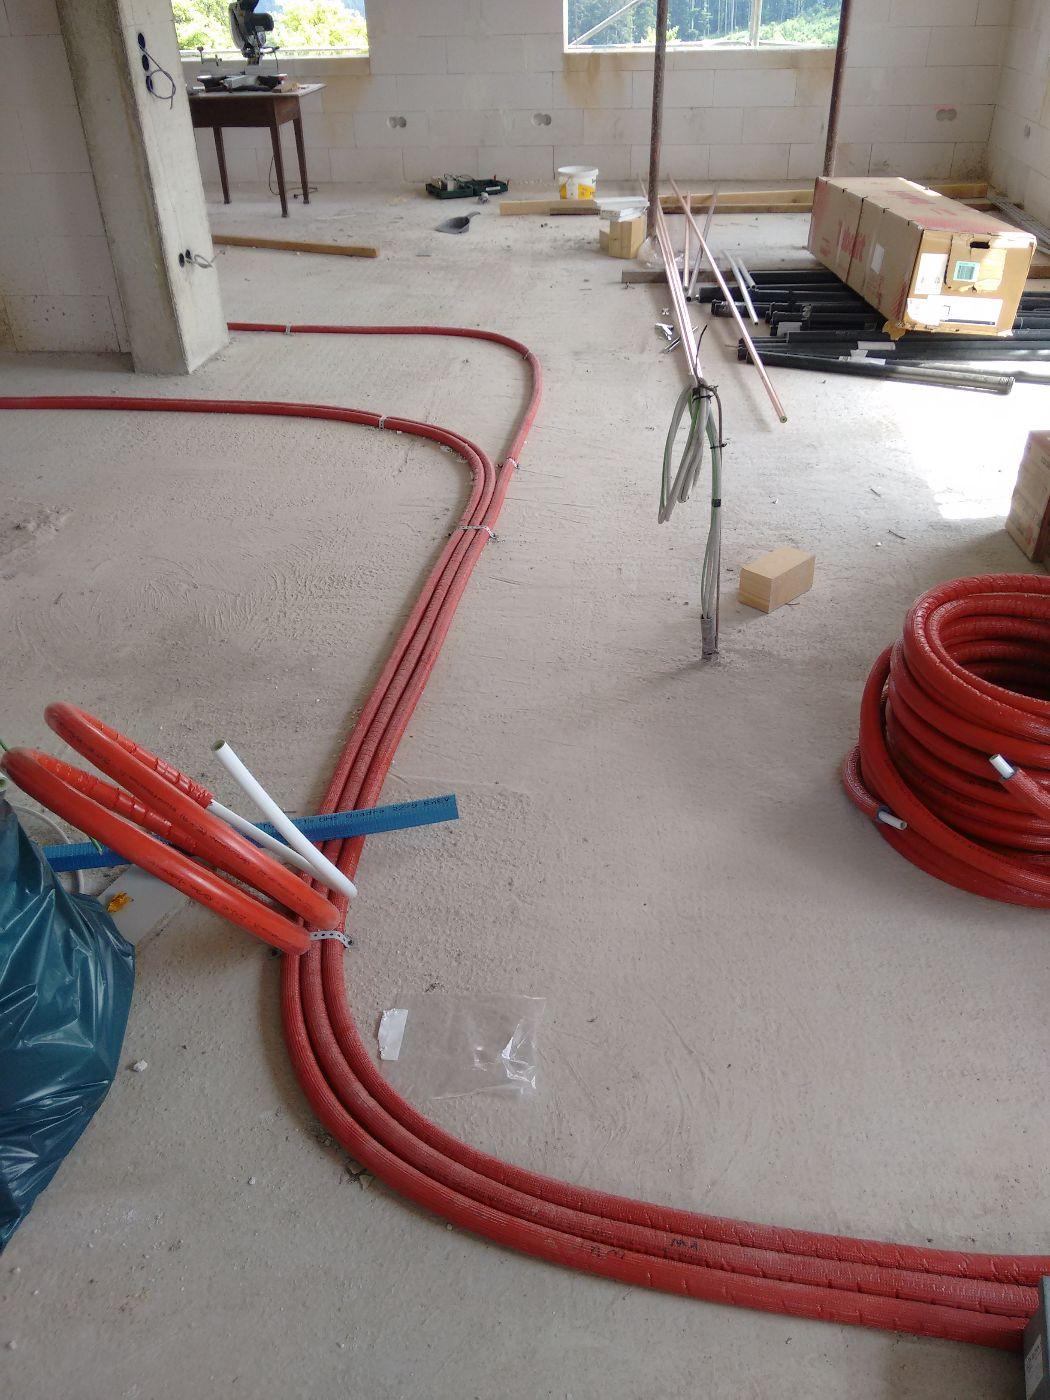 sanitär-installation, kabel verlegen, dach-dämmung | baublog